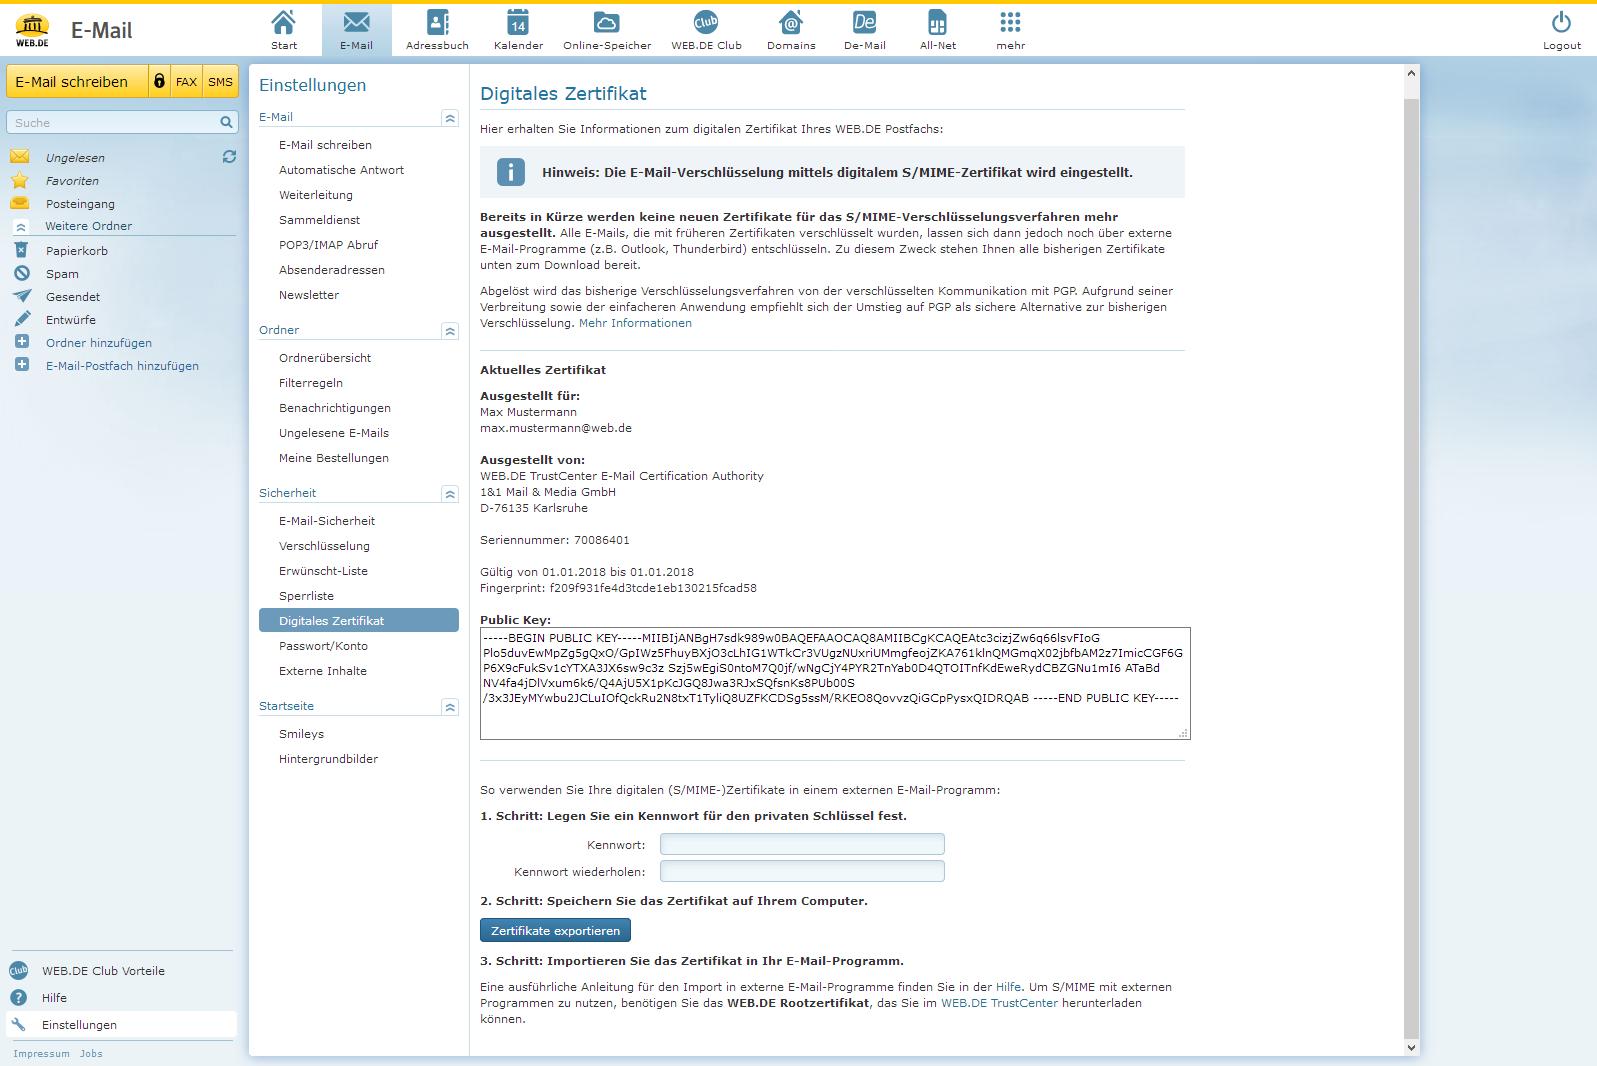 S/MIME-Zertifikate herunterladen